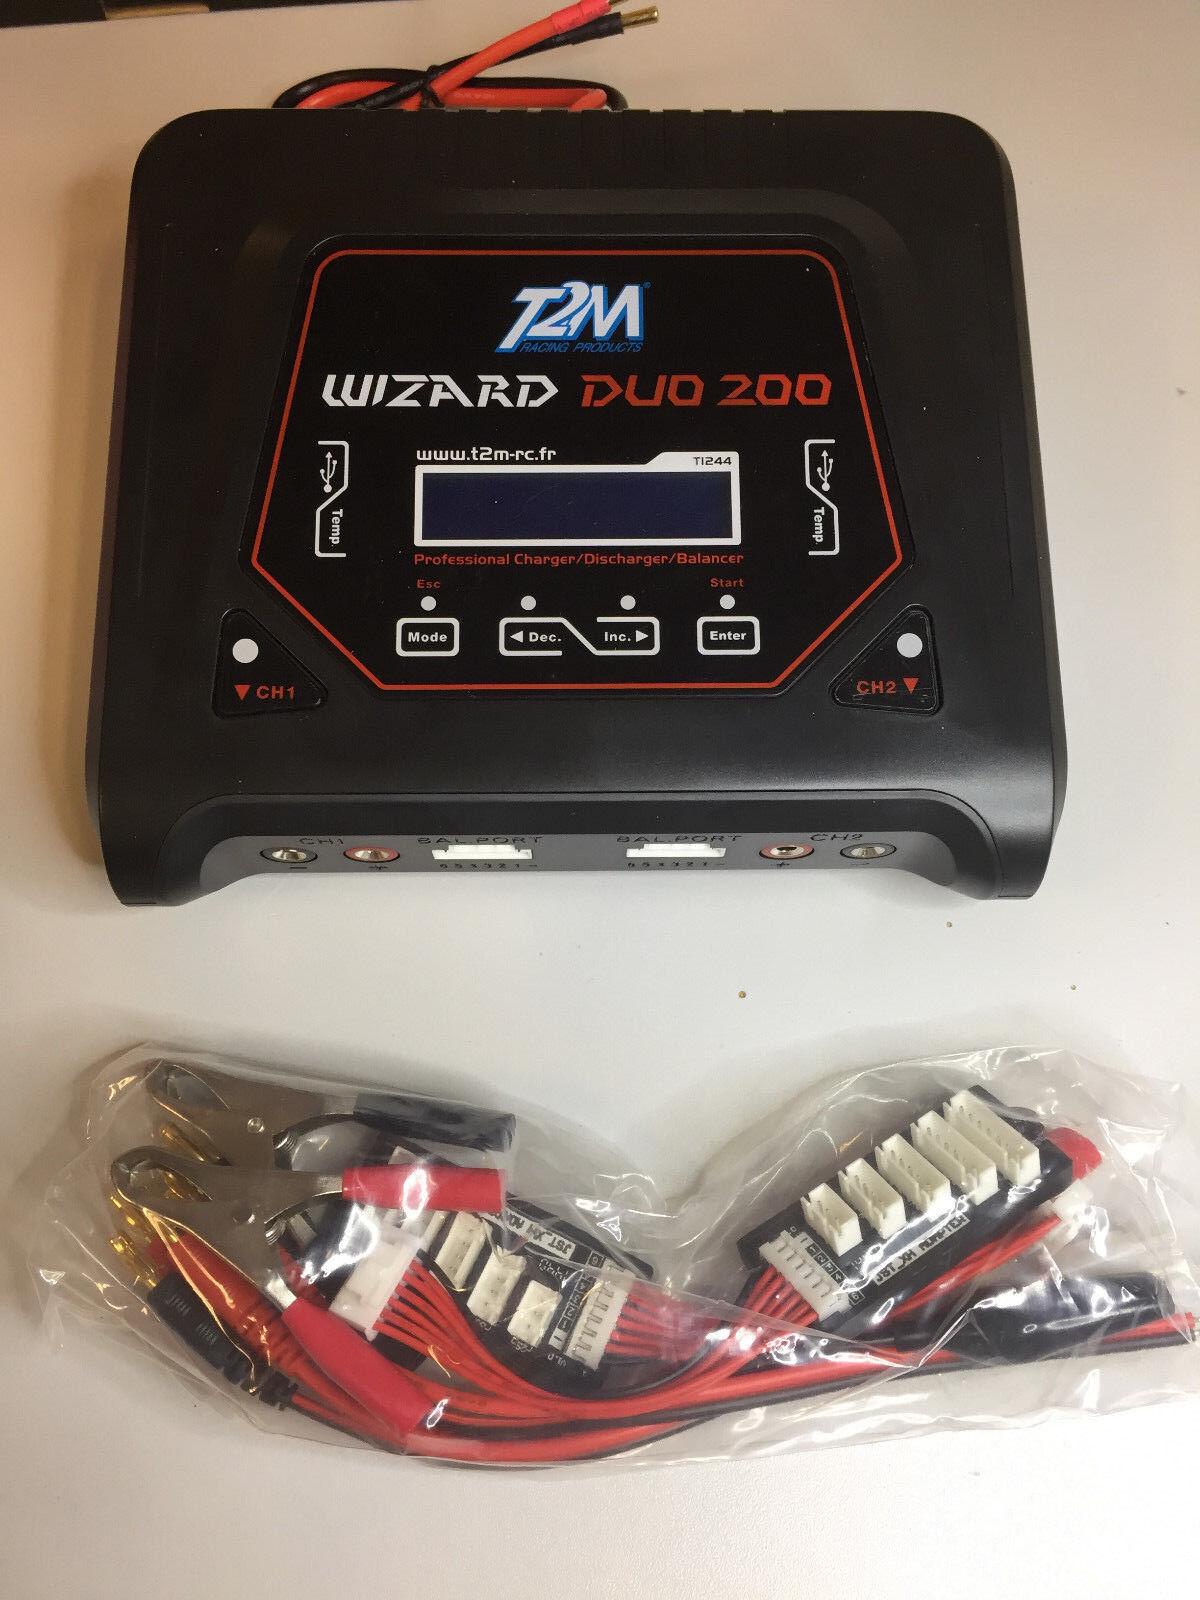 T2m cargador Wizard Duo 200 t1244